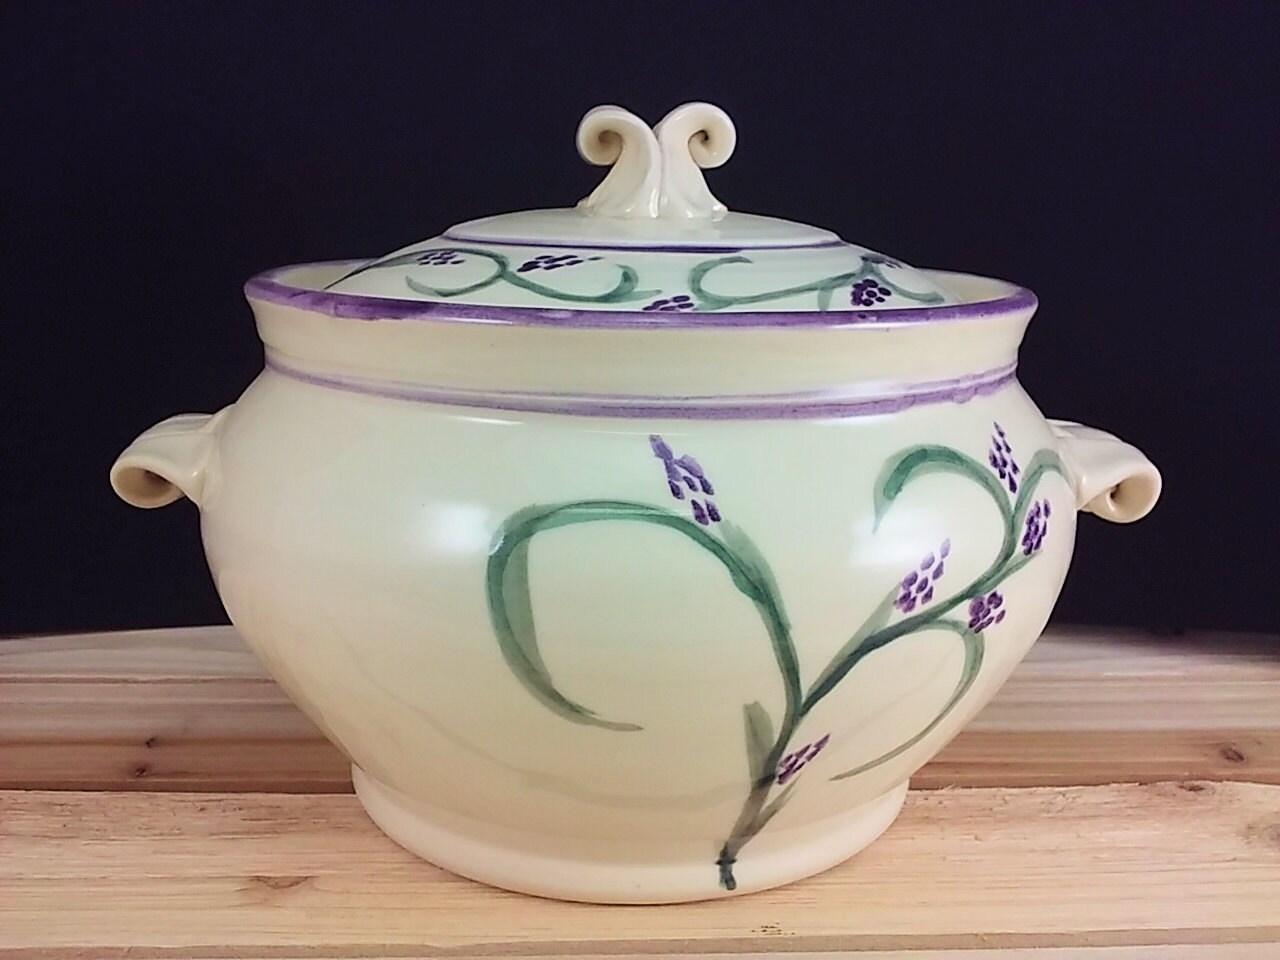 Lavender Purple Casserole Pottery Baking Dish Green And Cream